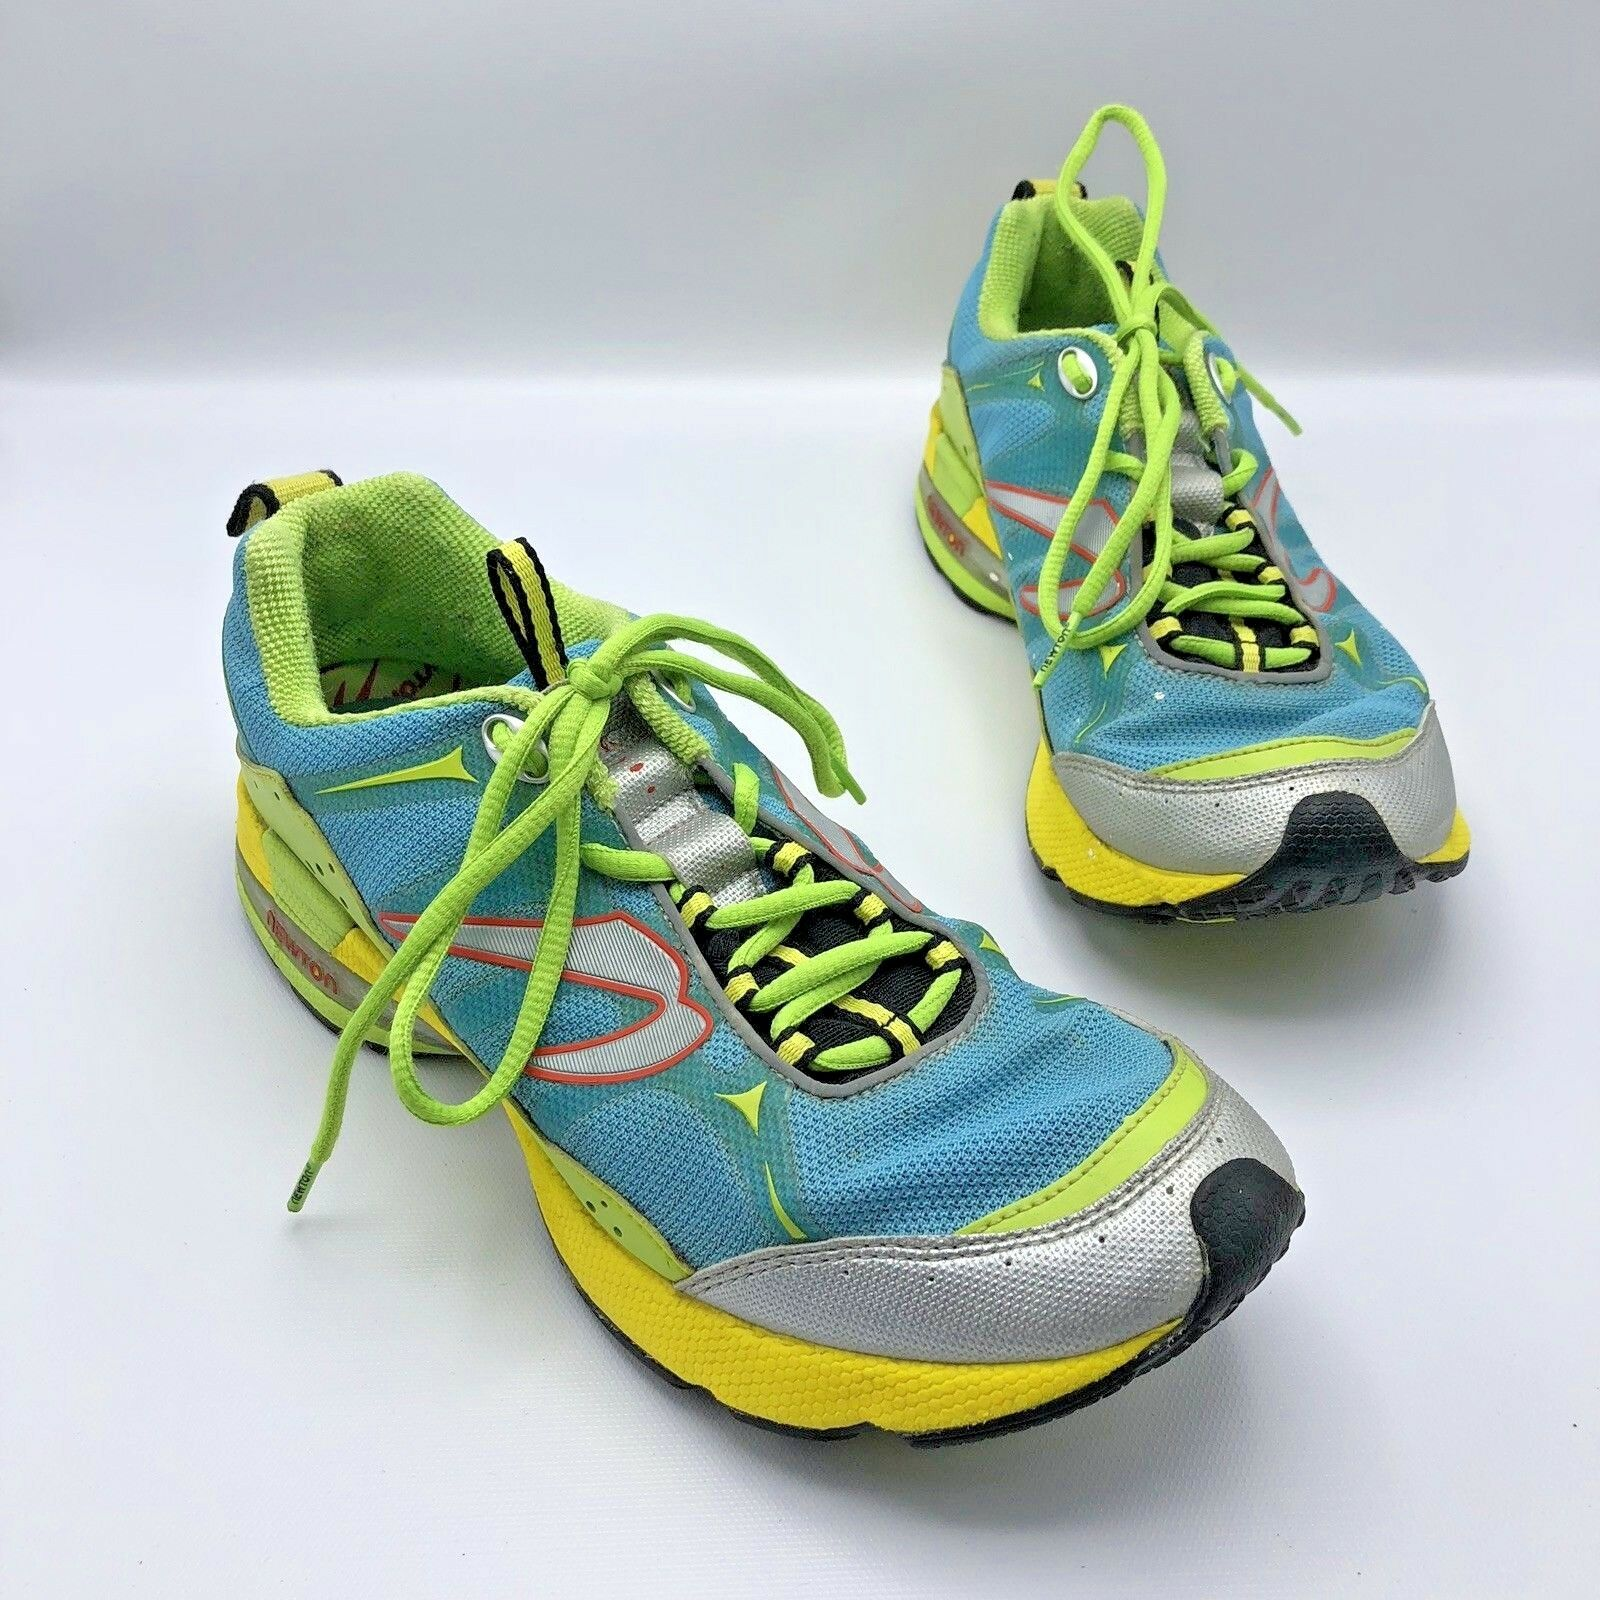 Newton Terra Momentum Women Green bluee Yellow Running shoes Size 10.5 Pre Owned